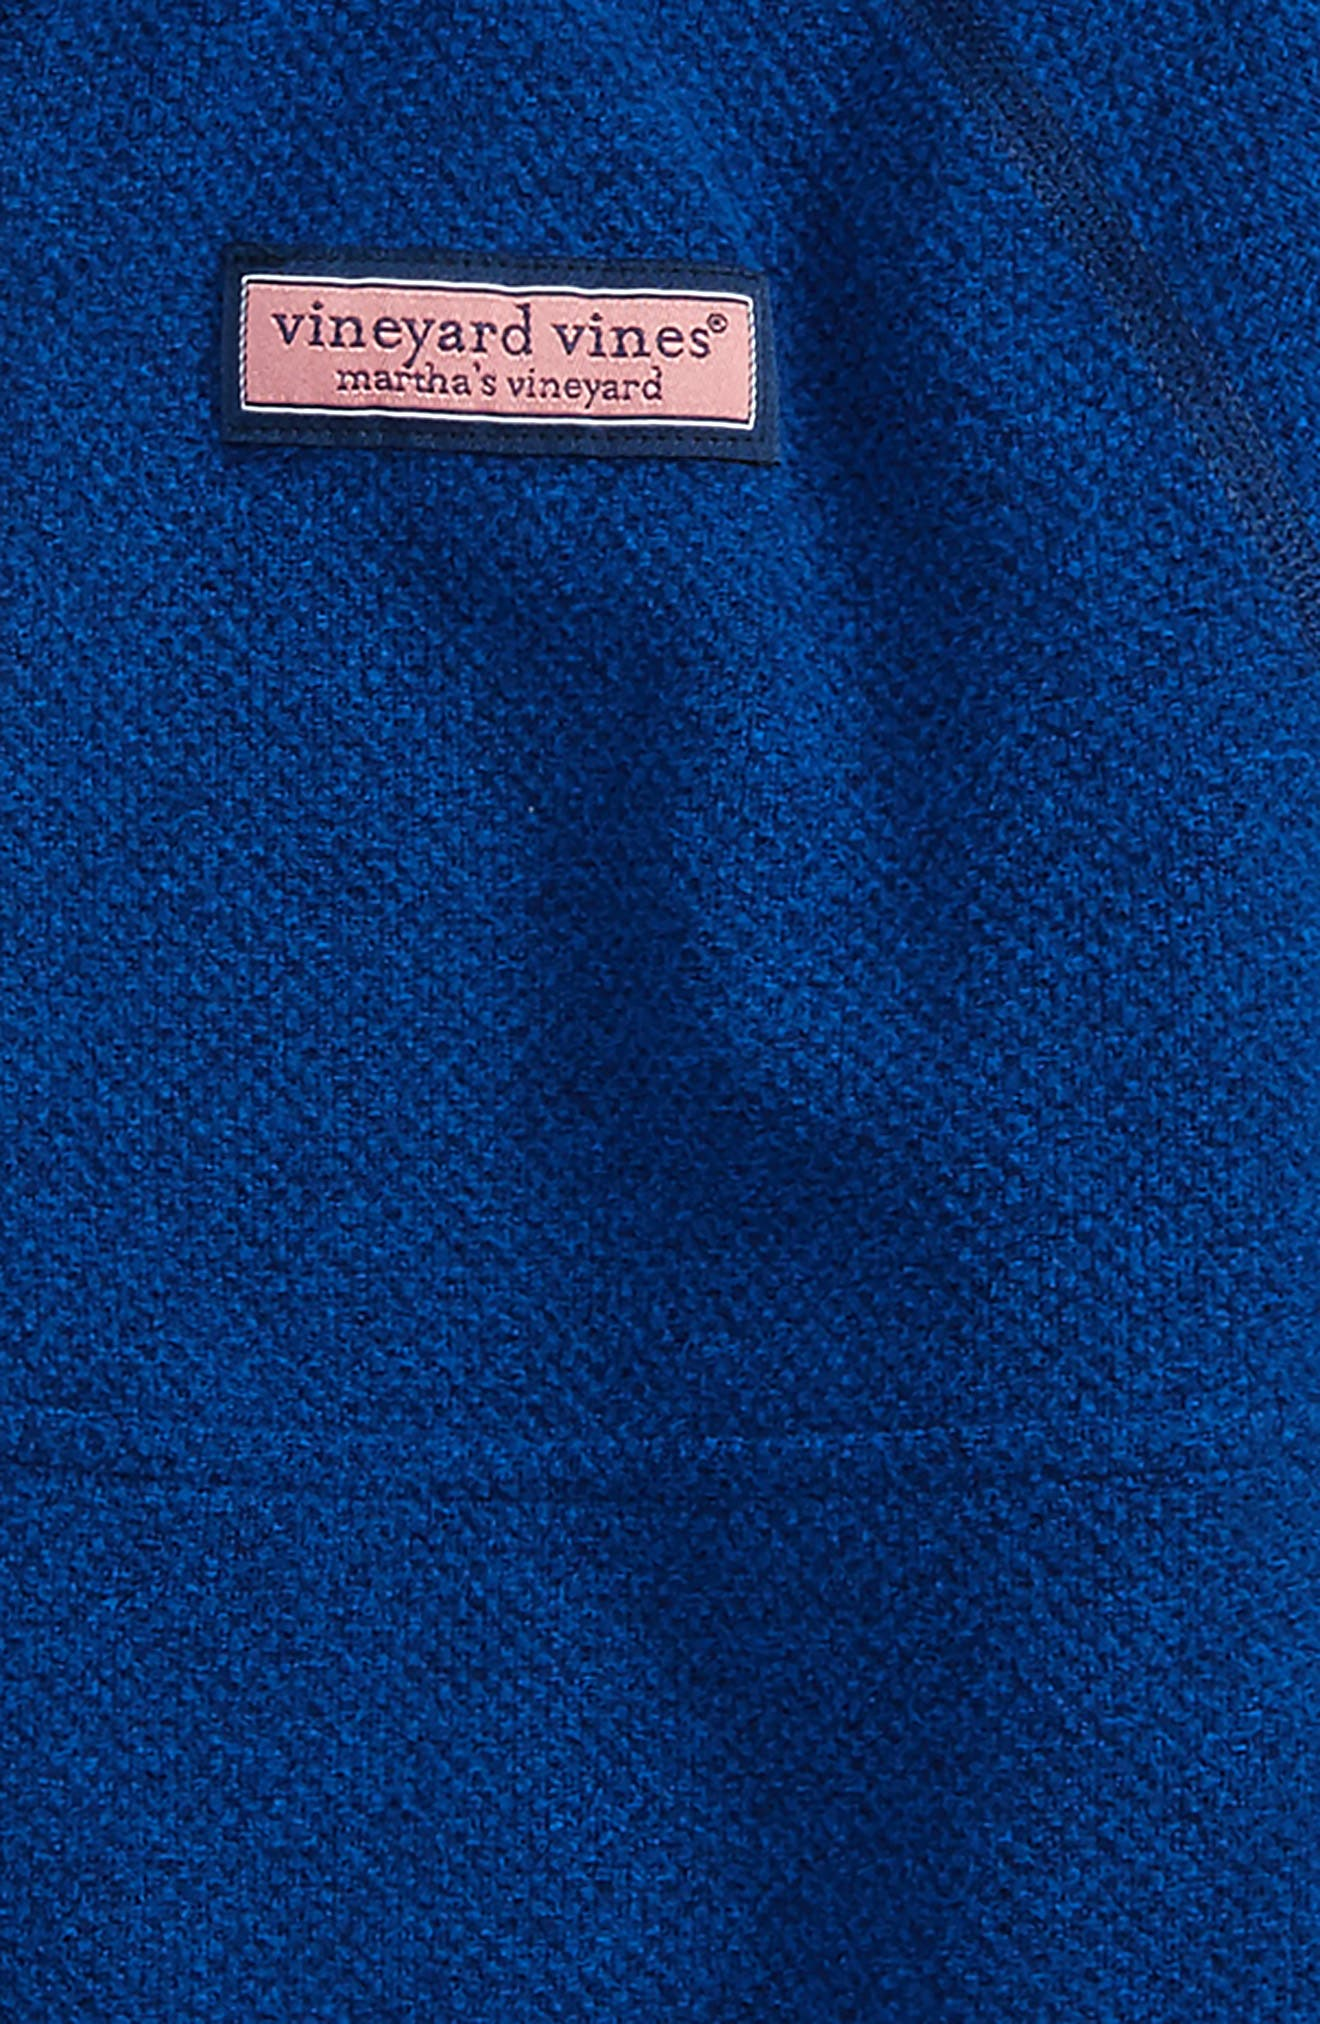 Quarter Zip Sweater,                             Alternate thumbnail 2, color,                             406